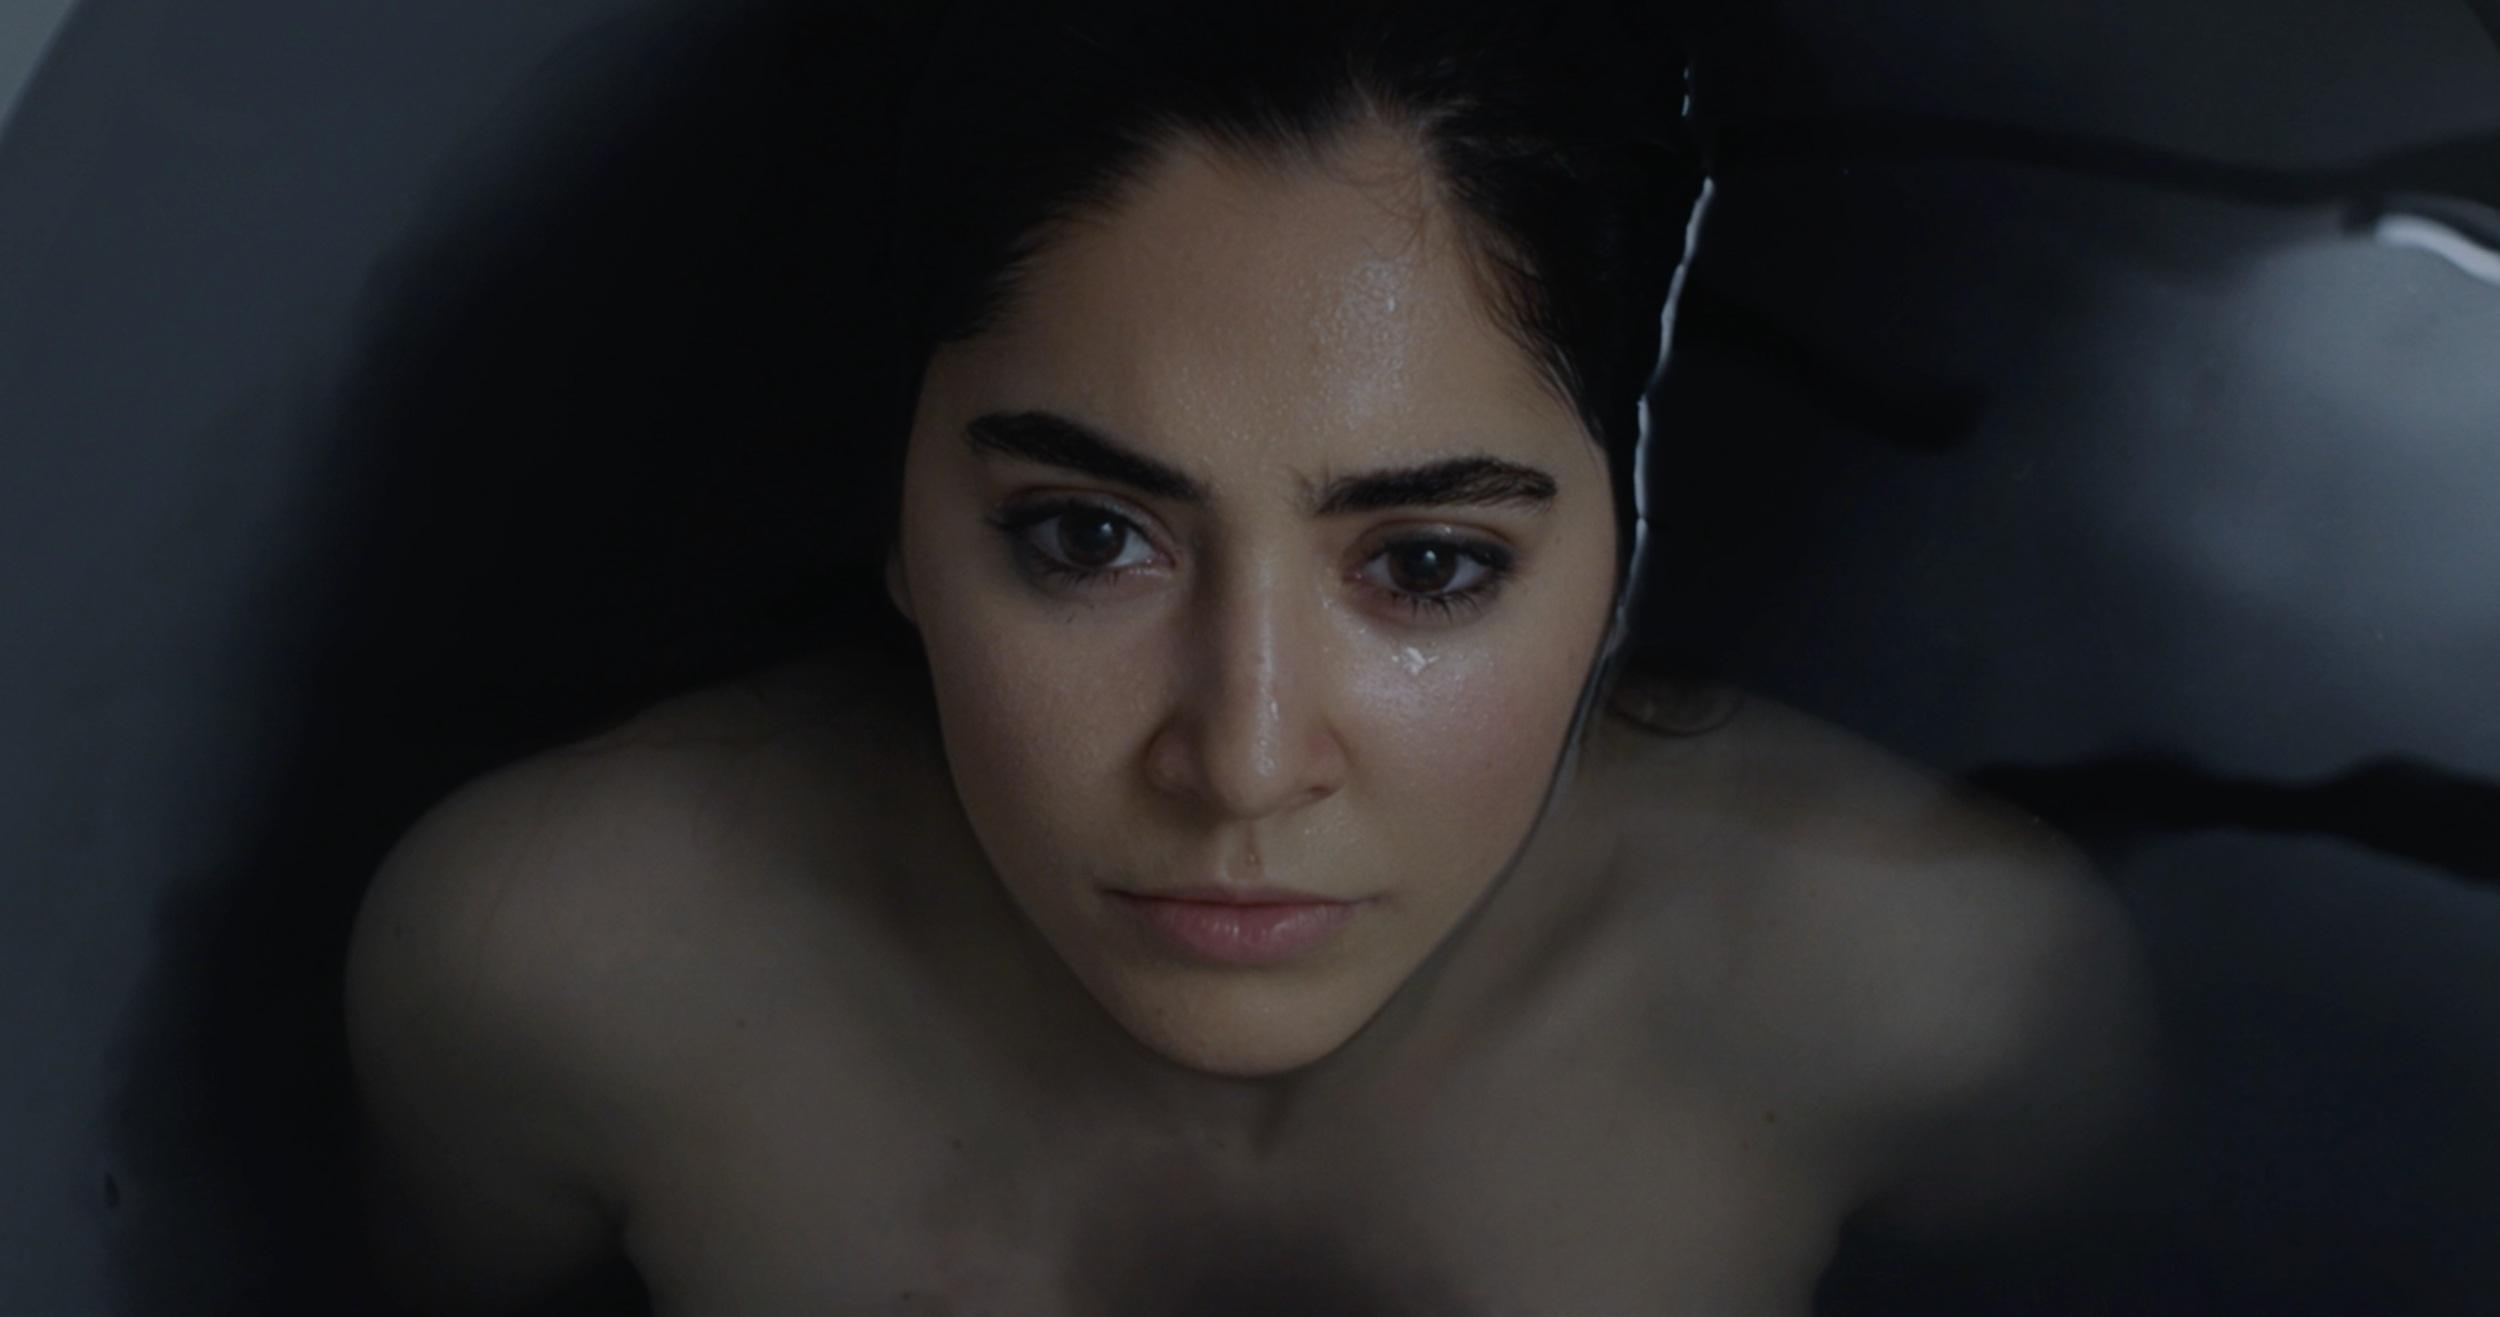 Giuliana Guarino as Ella